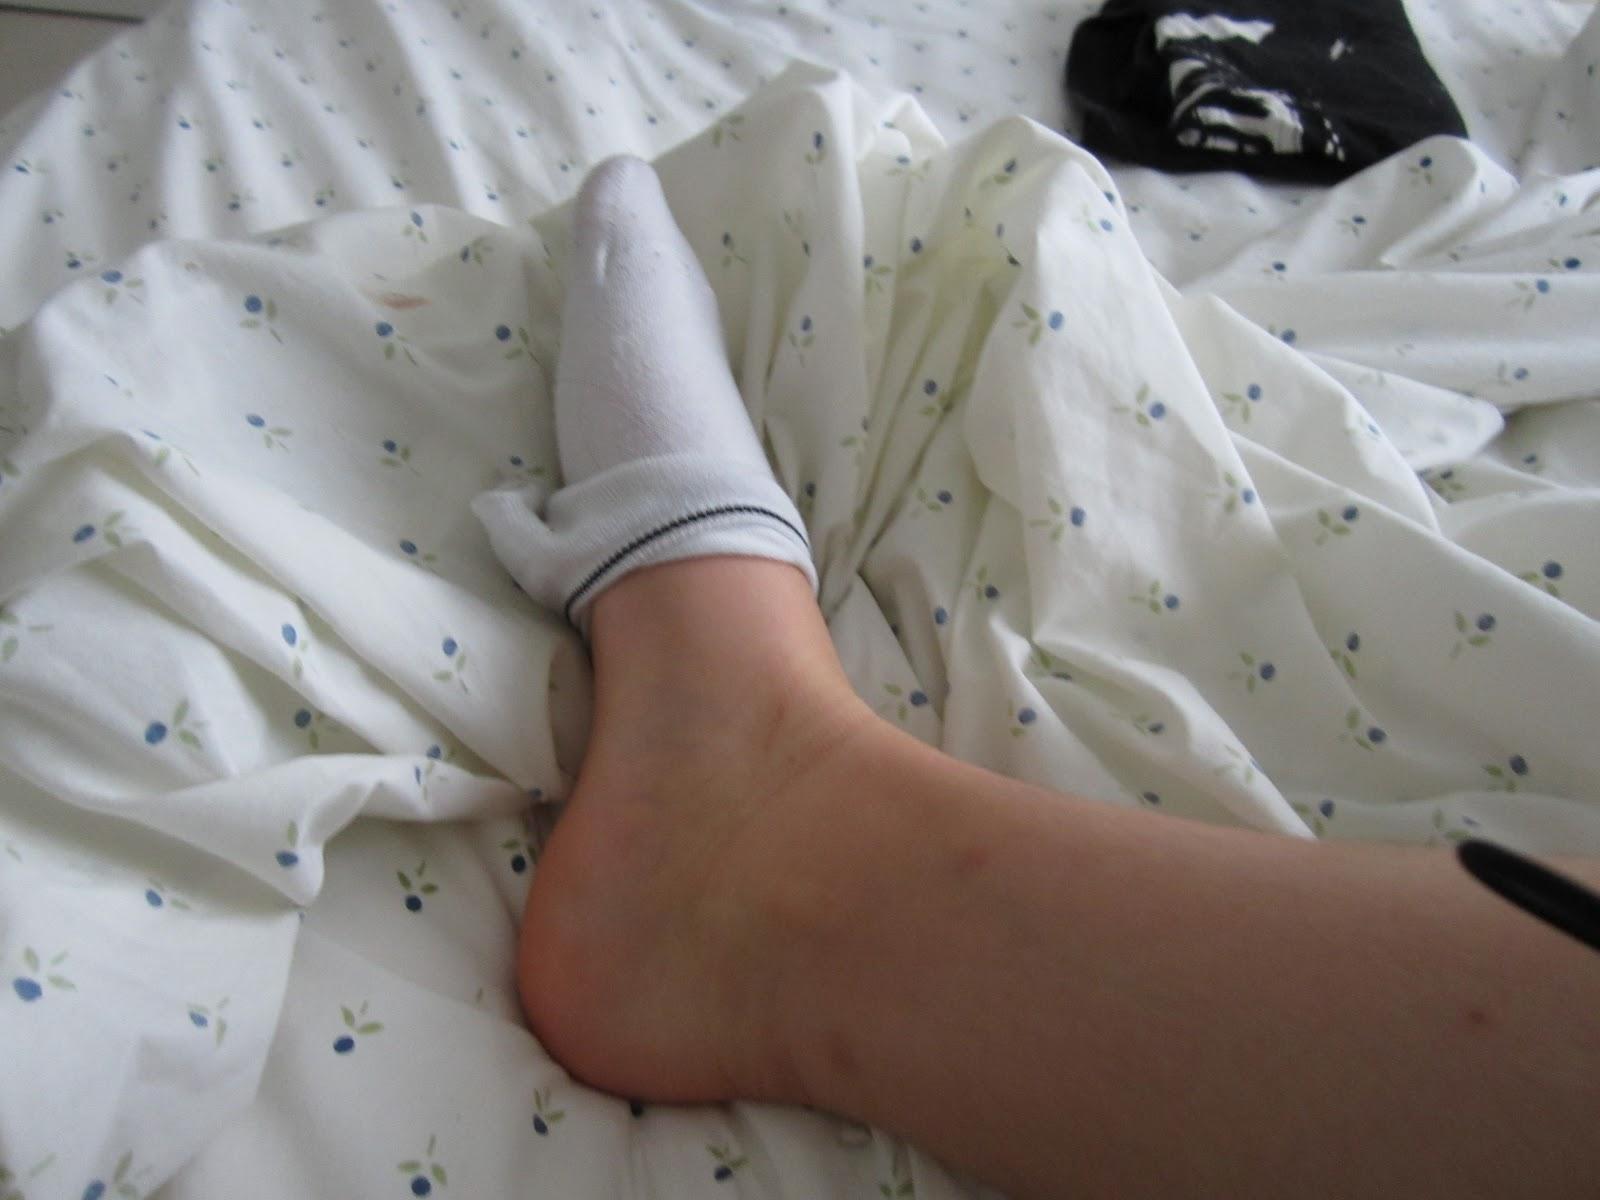 lesbian foot pics Free big tit lesbians pics.